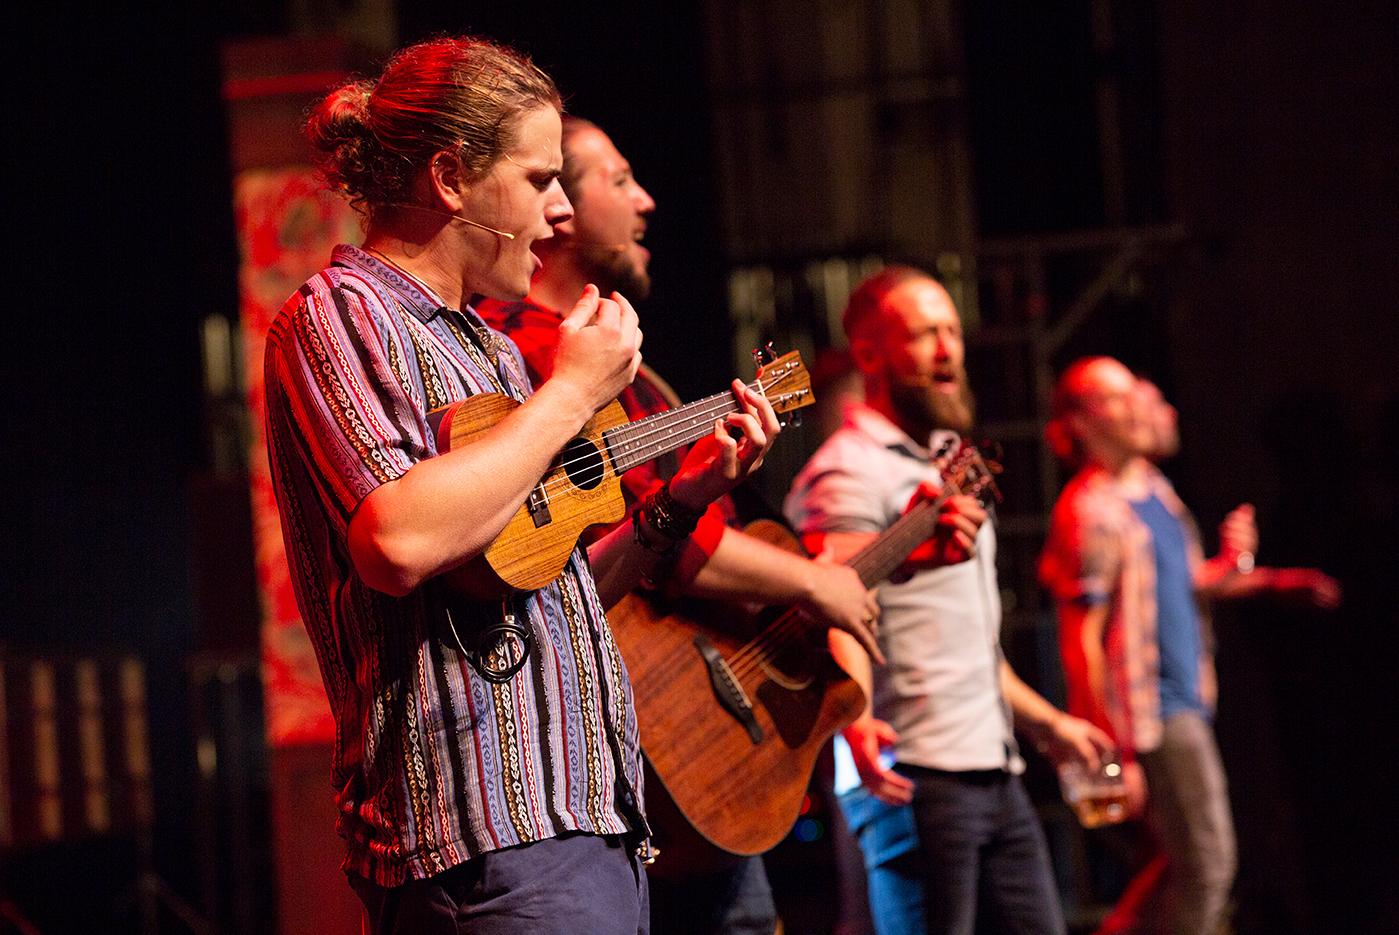 Aidan Banyard, Peter Lawrence, Tom Brandon in The Choir of Man. Photos by Brian Wright.